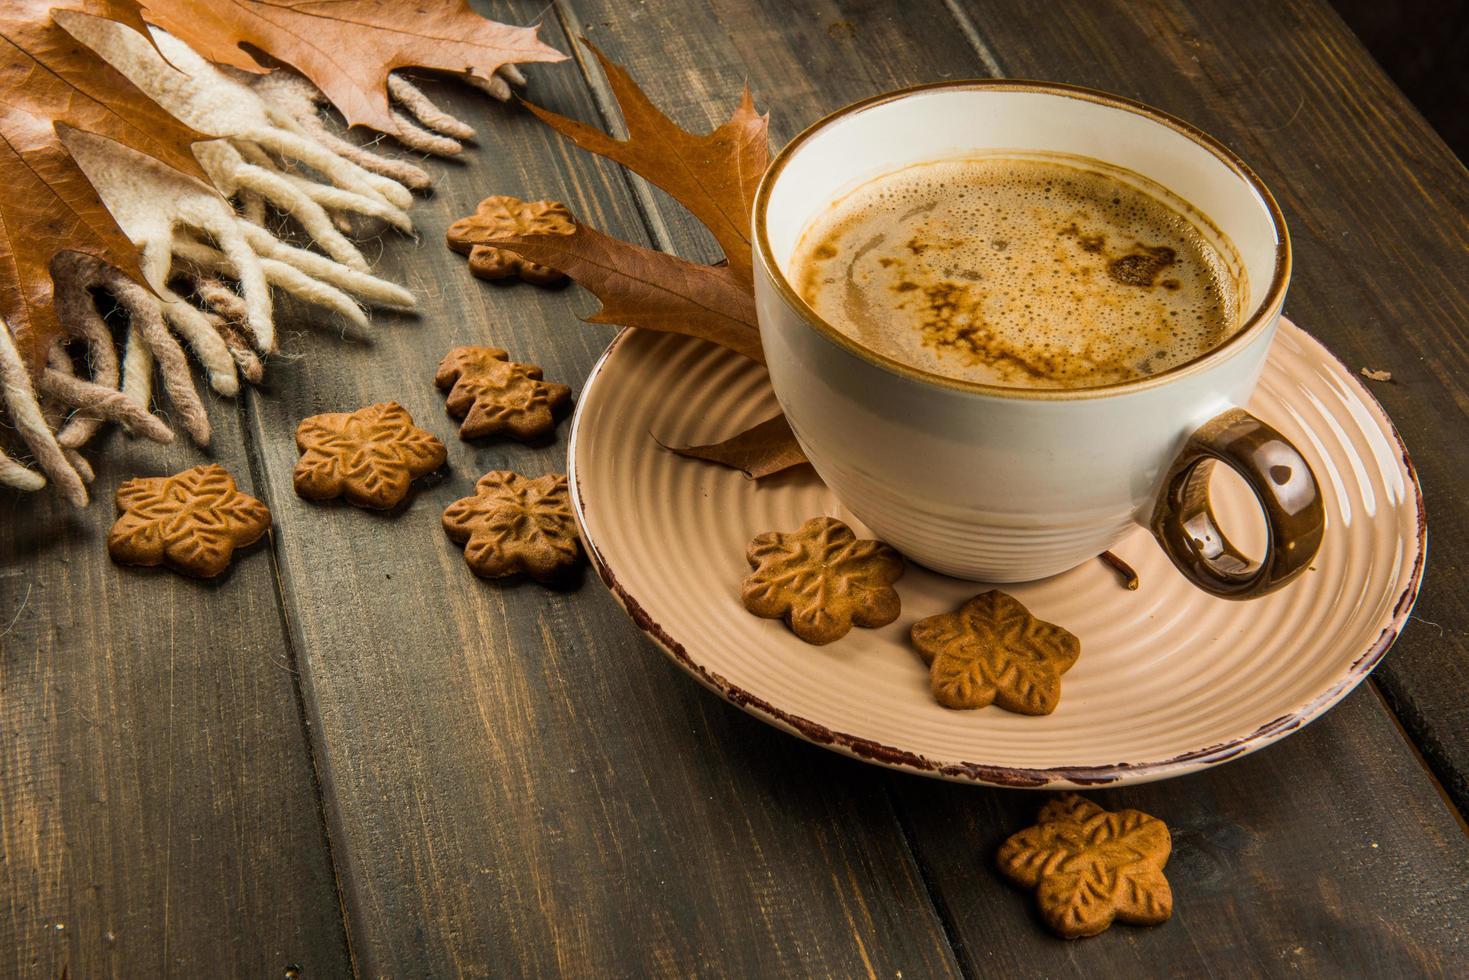 kopp varmt kaffe med kakor foto